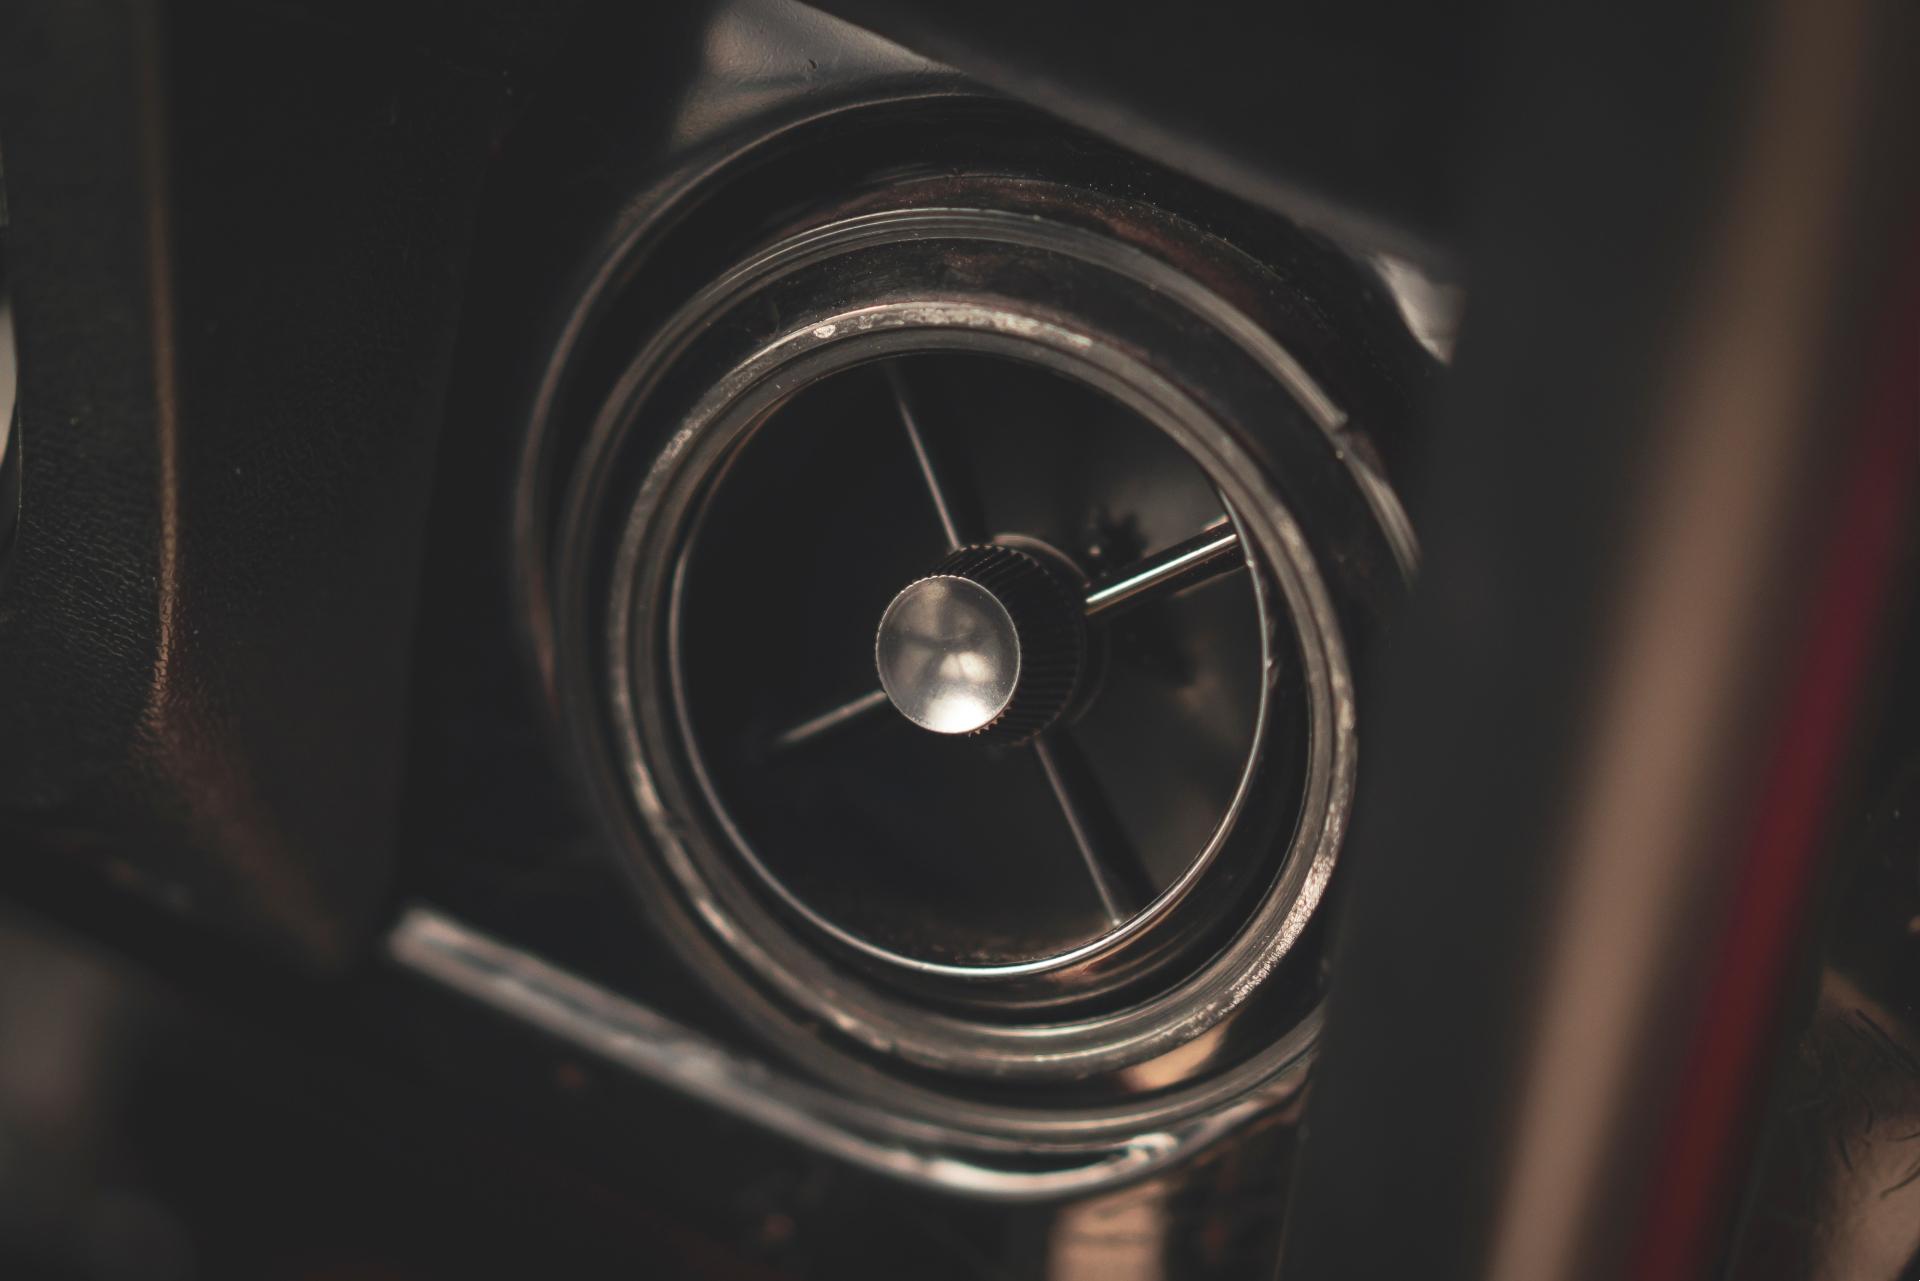 MST Mk2 vent detail